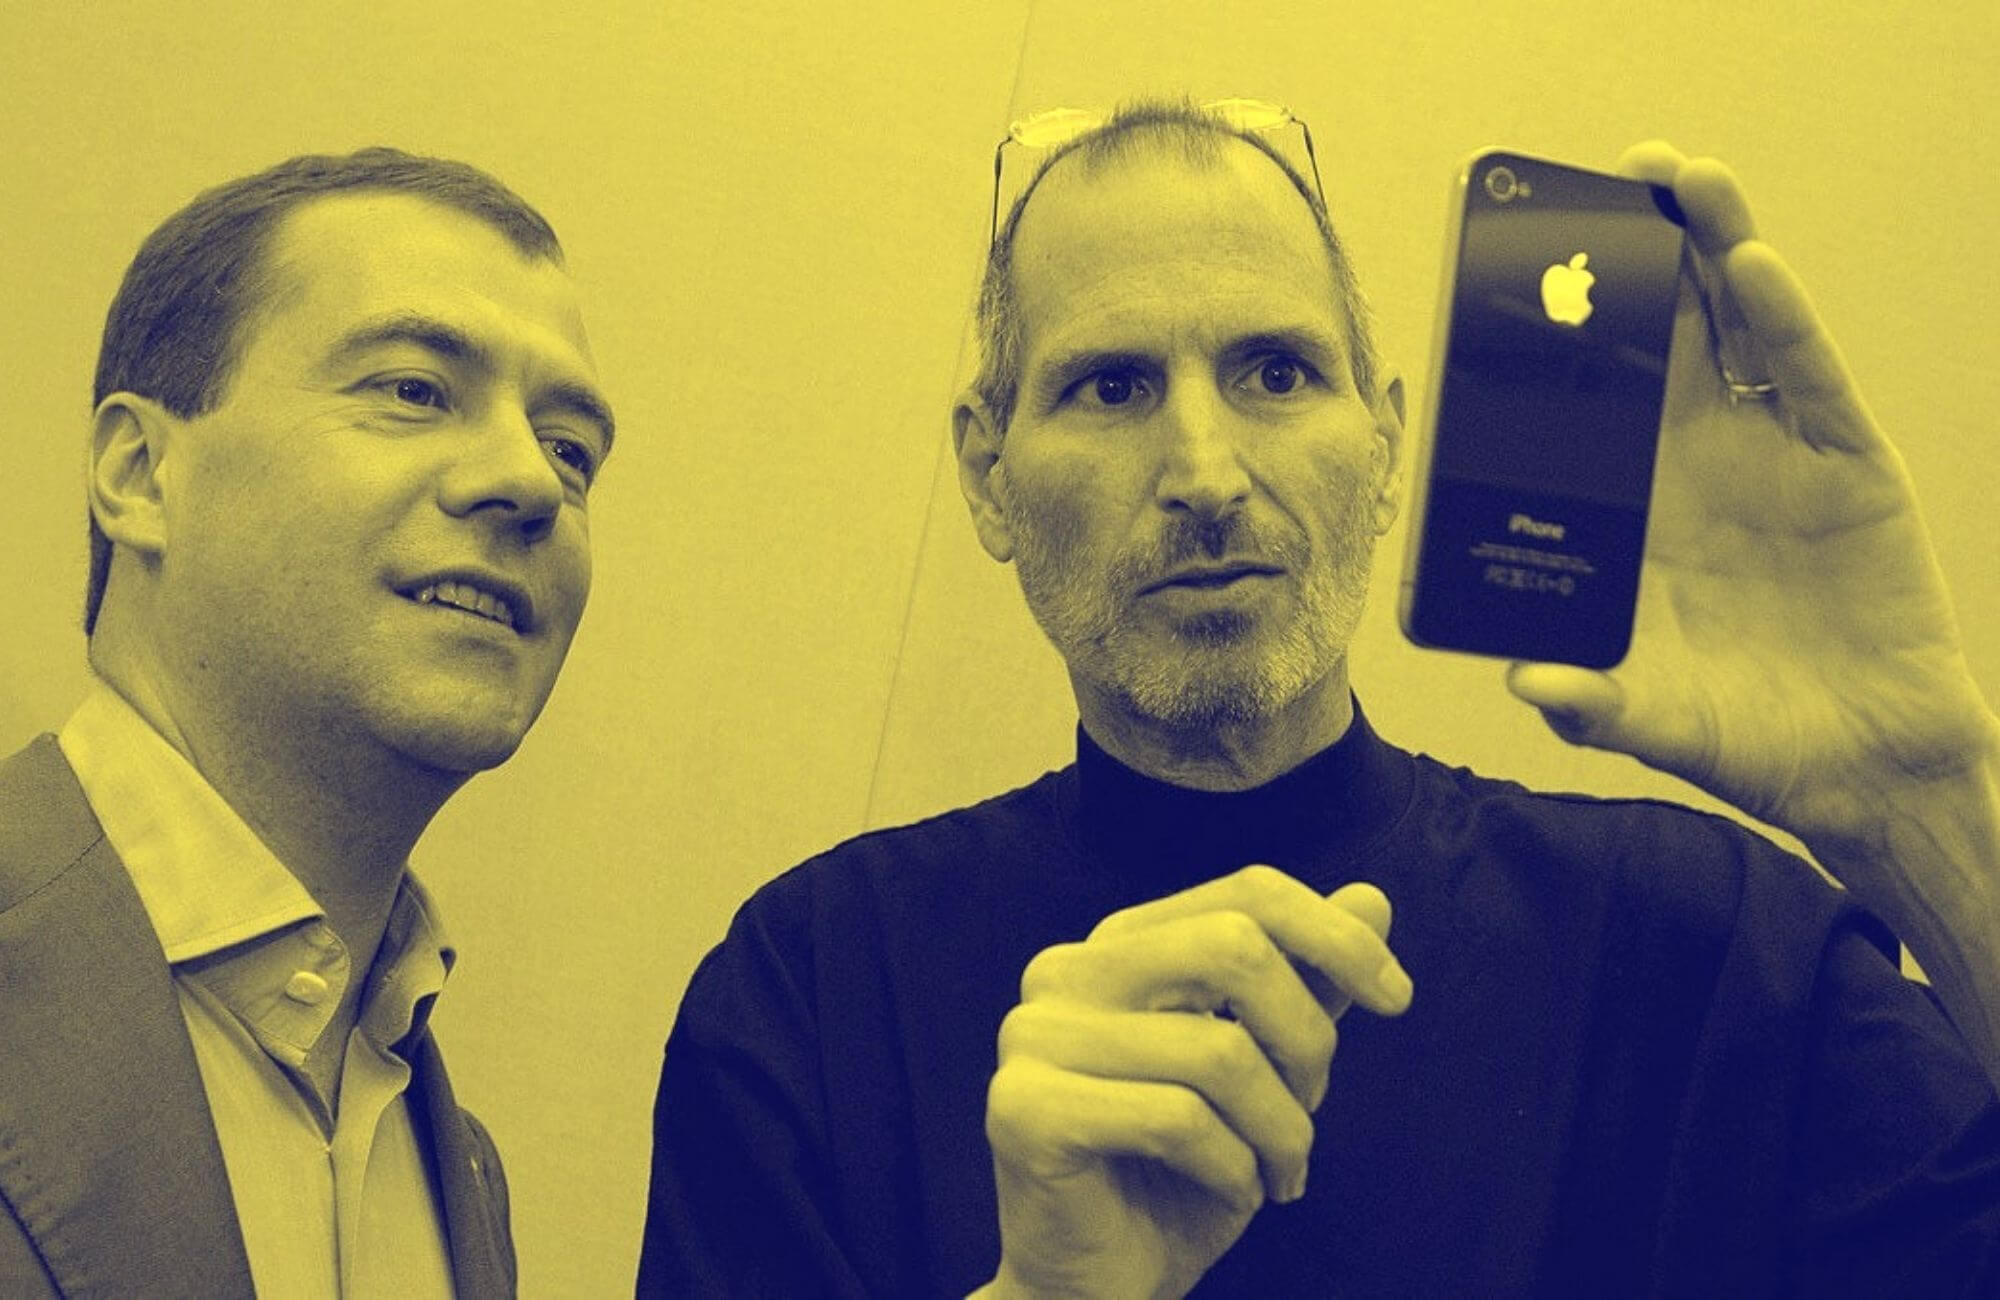 What was Steve Jobs' leadership style?